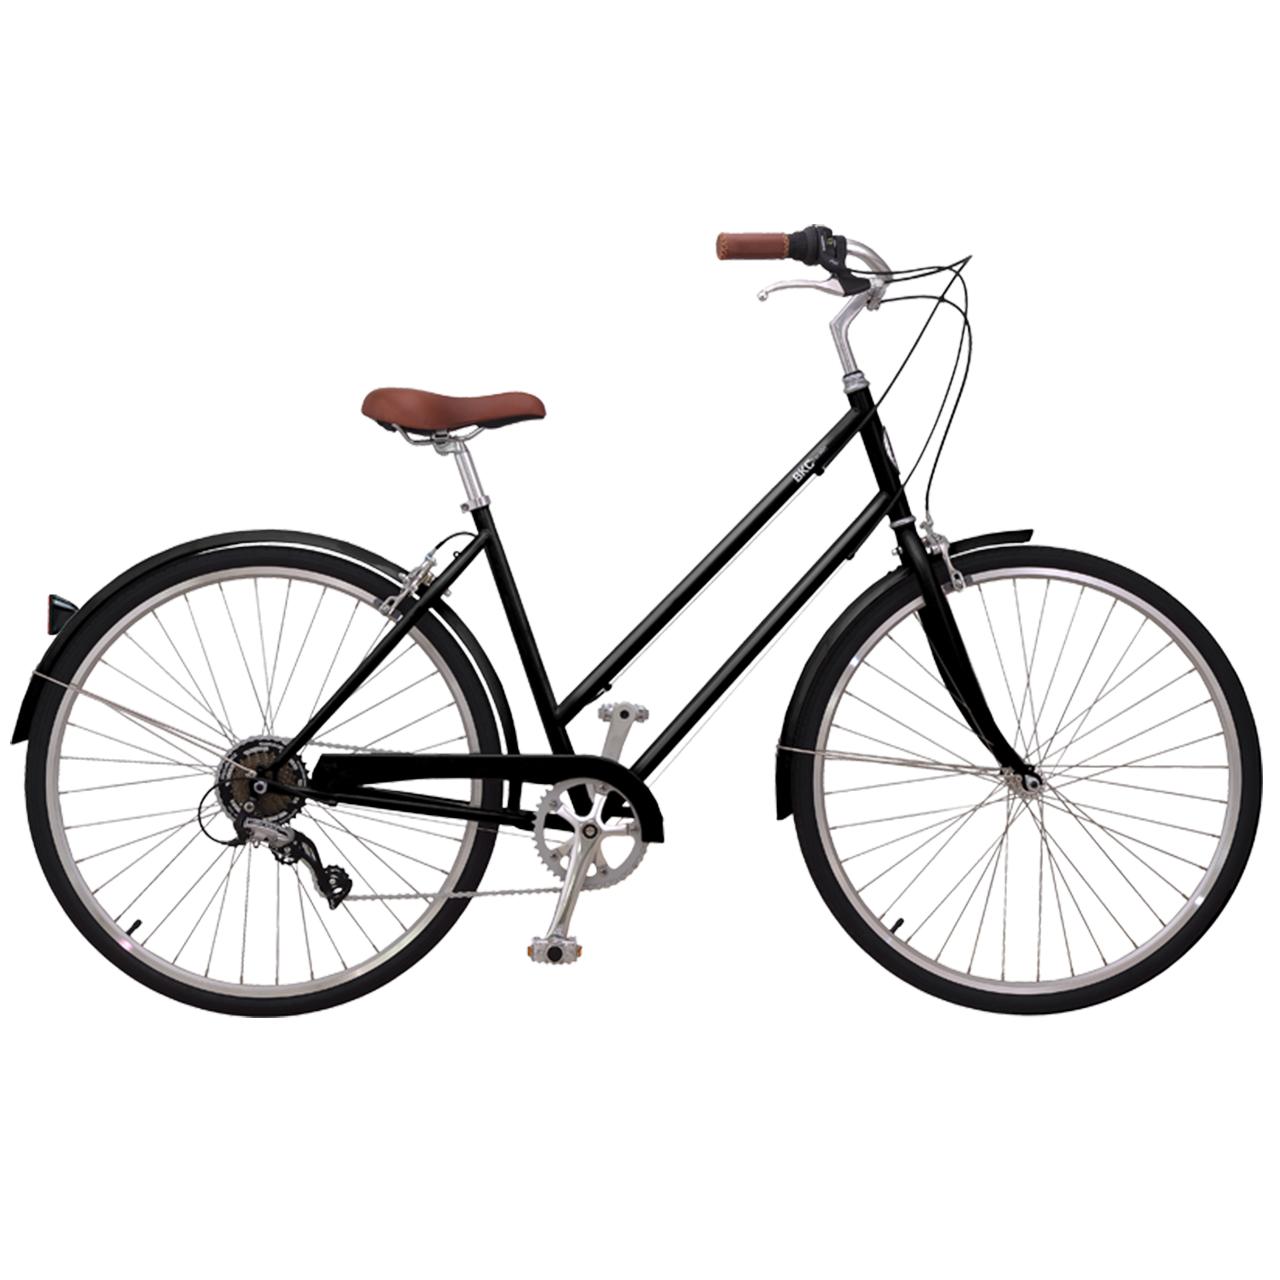 Franklin 7 Speed Commuter Bike Urban Bike Bicycle